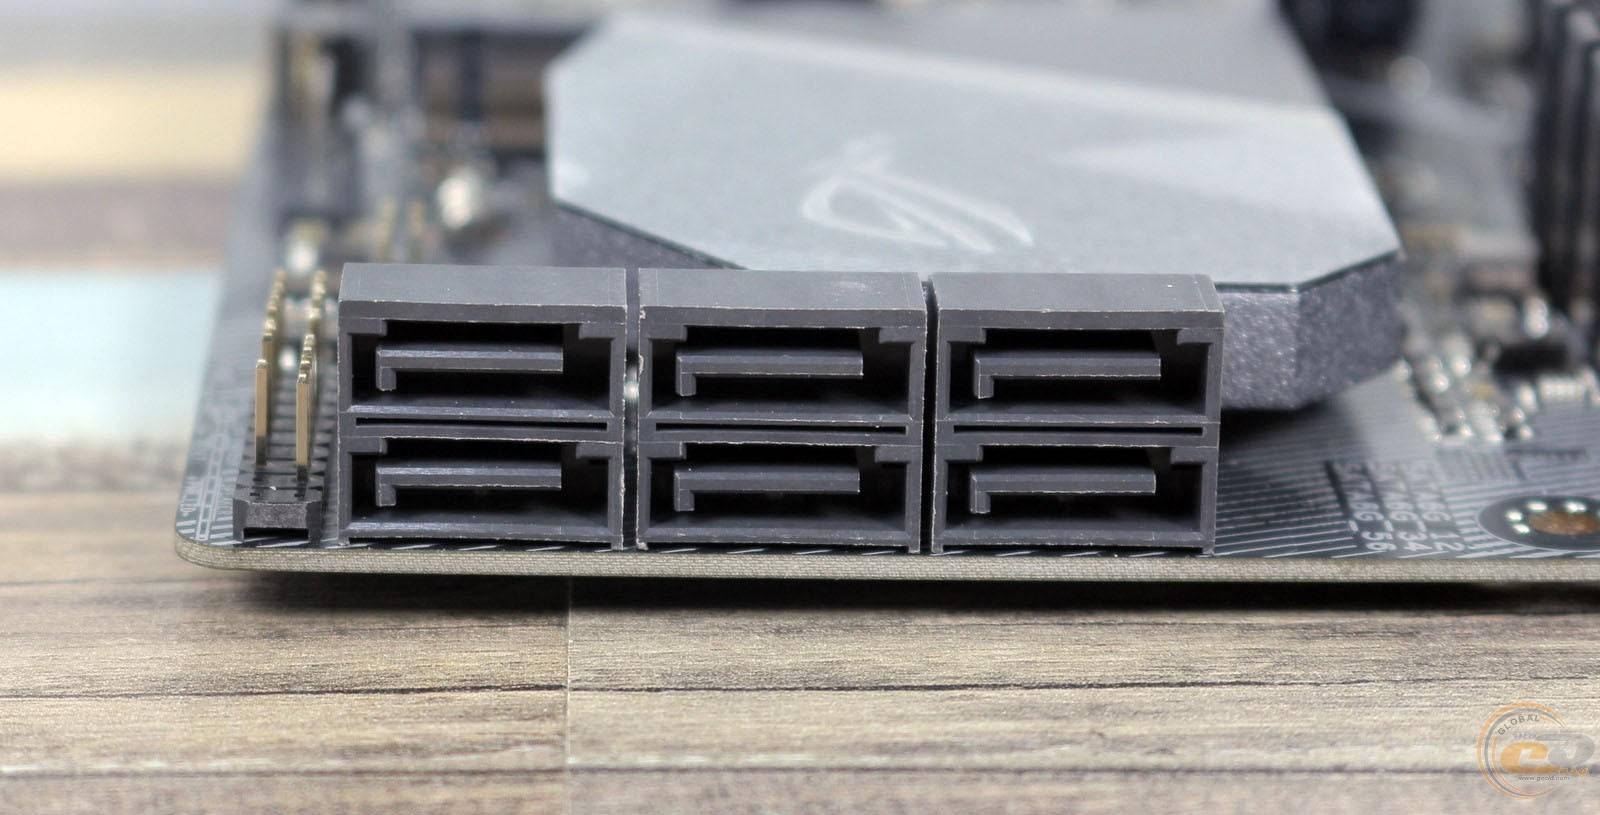 ROG STRIX Z370-G GAMING SATA разьемы